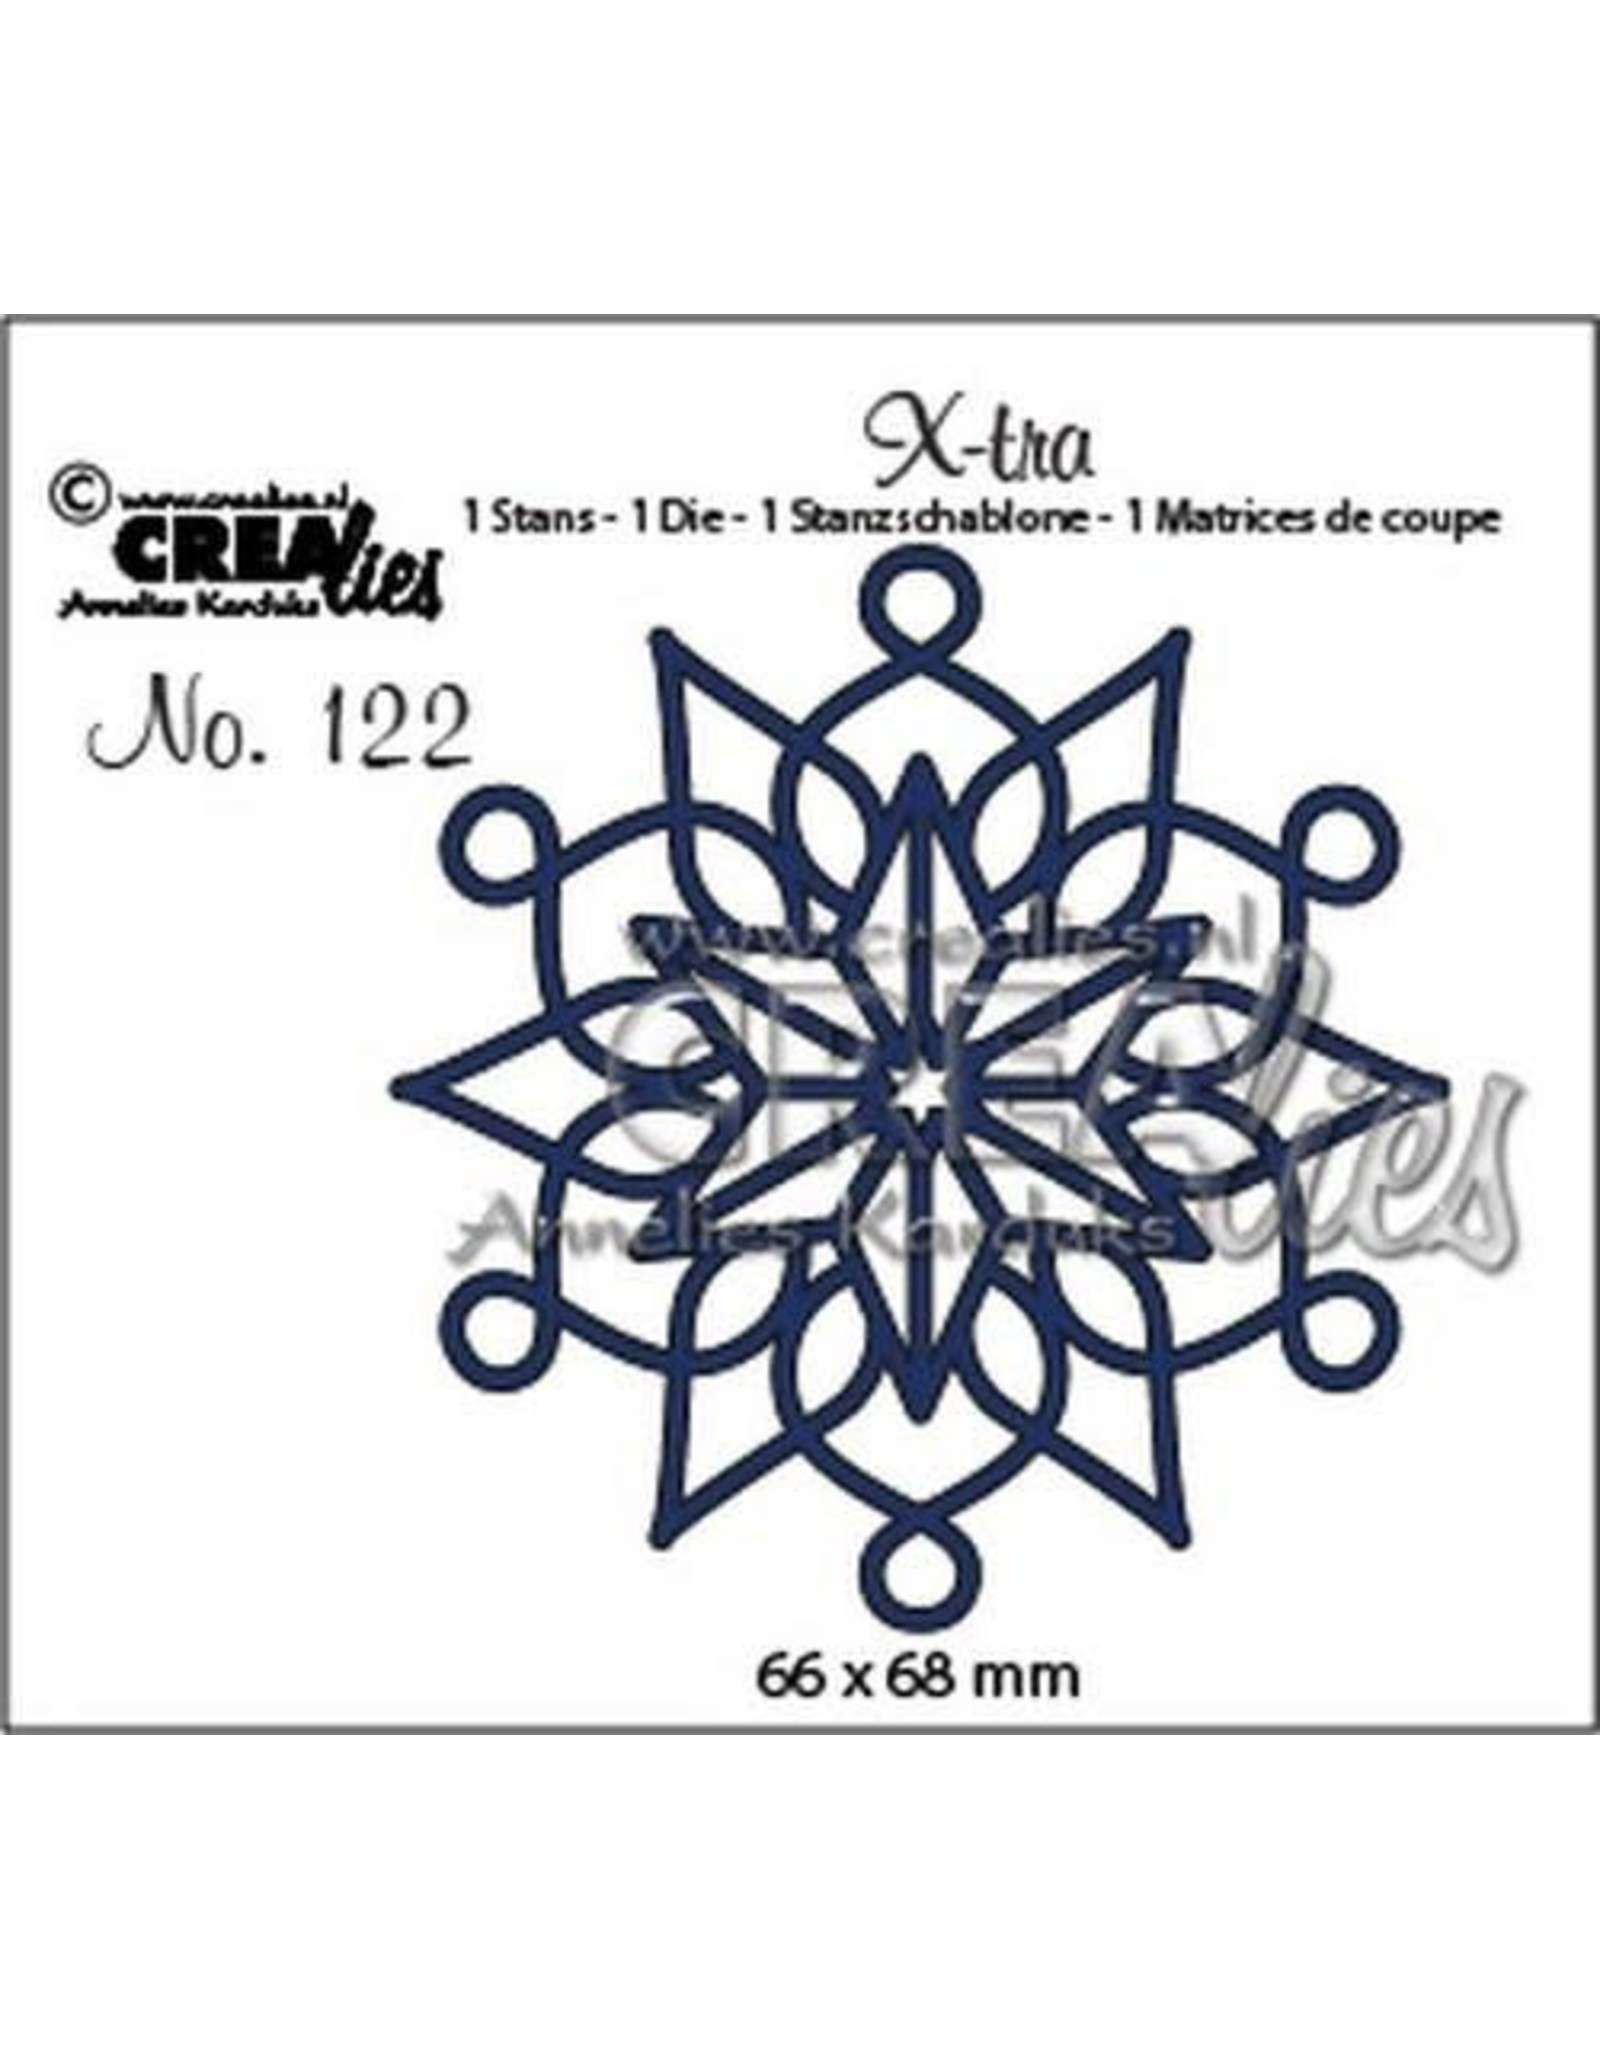 Crealies X-tra sneeuwvlok A CLXtra122 66 x 68 mm